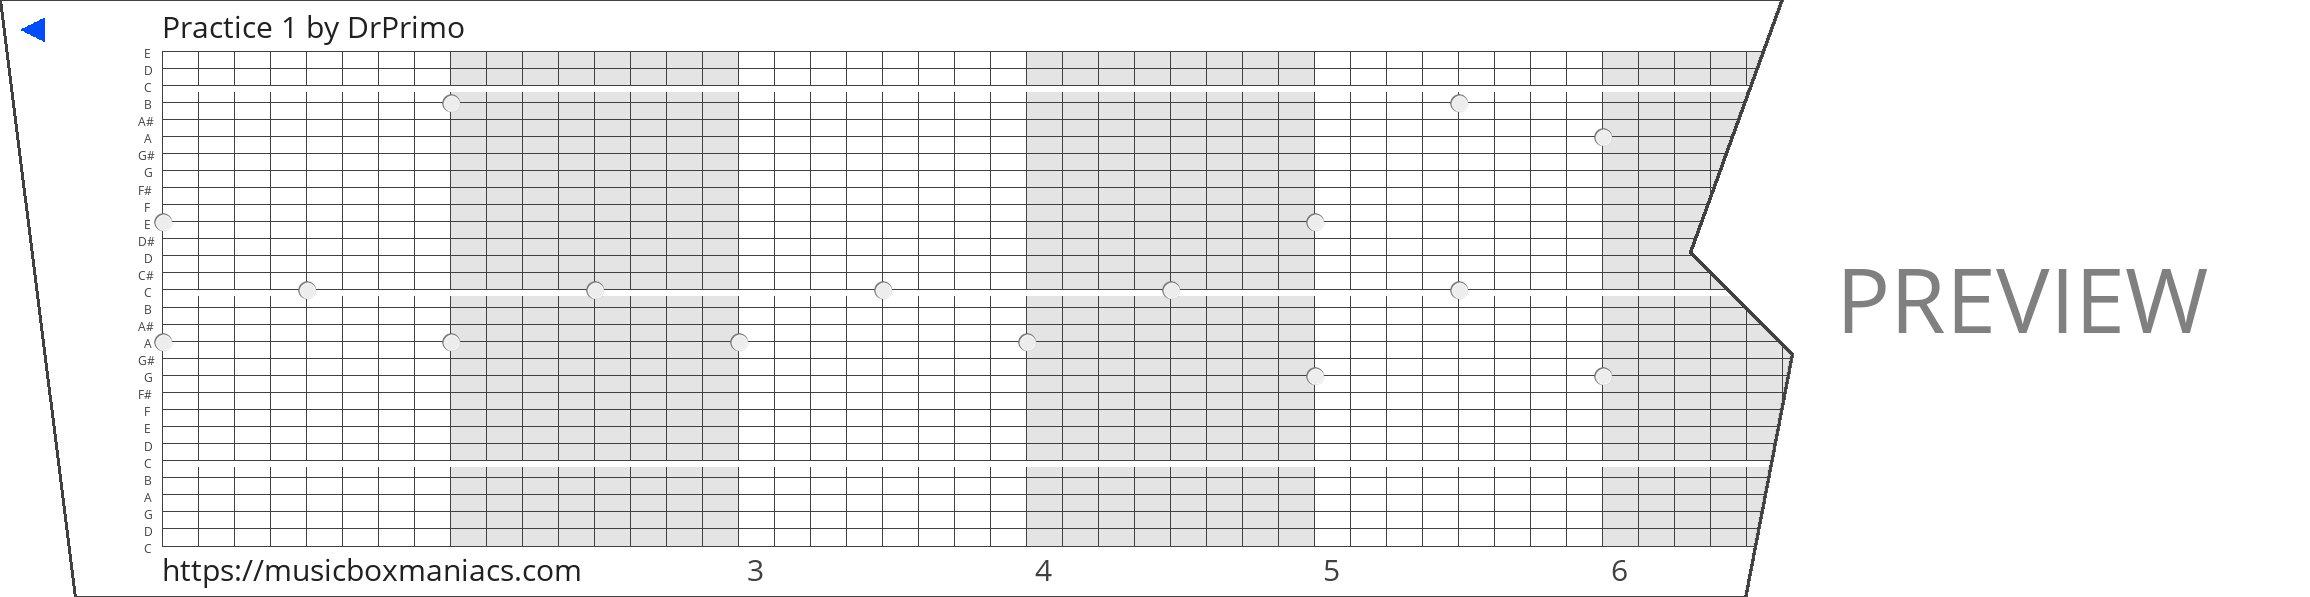 Practice 1 30 note music box paper strip